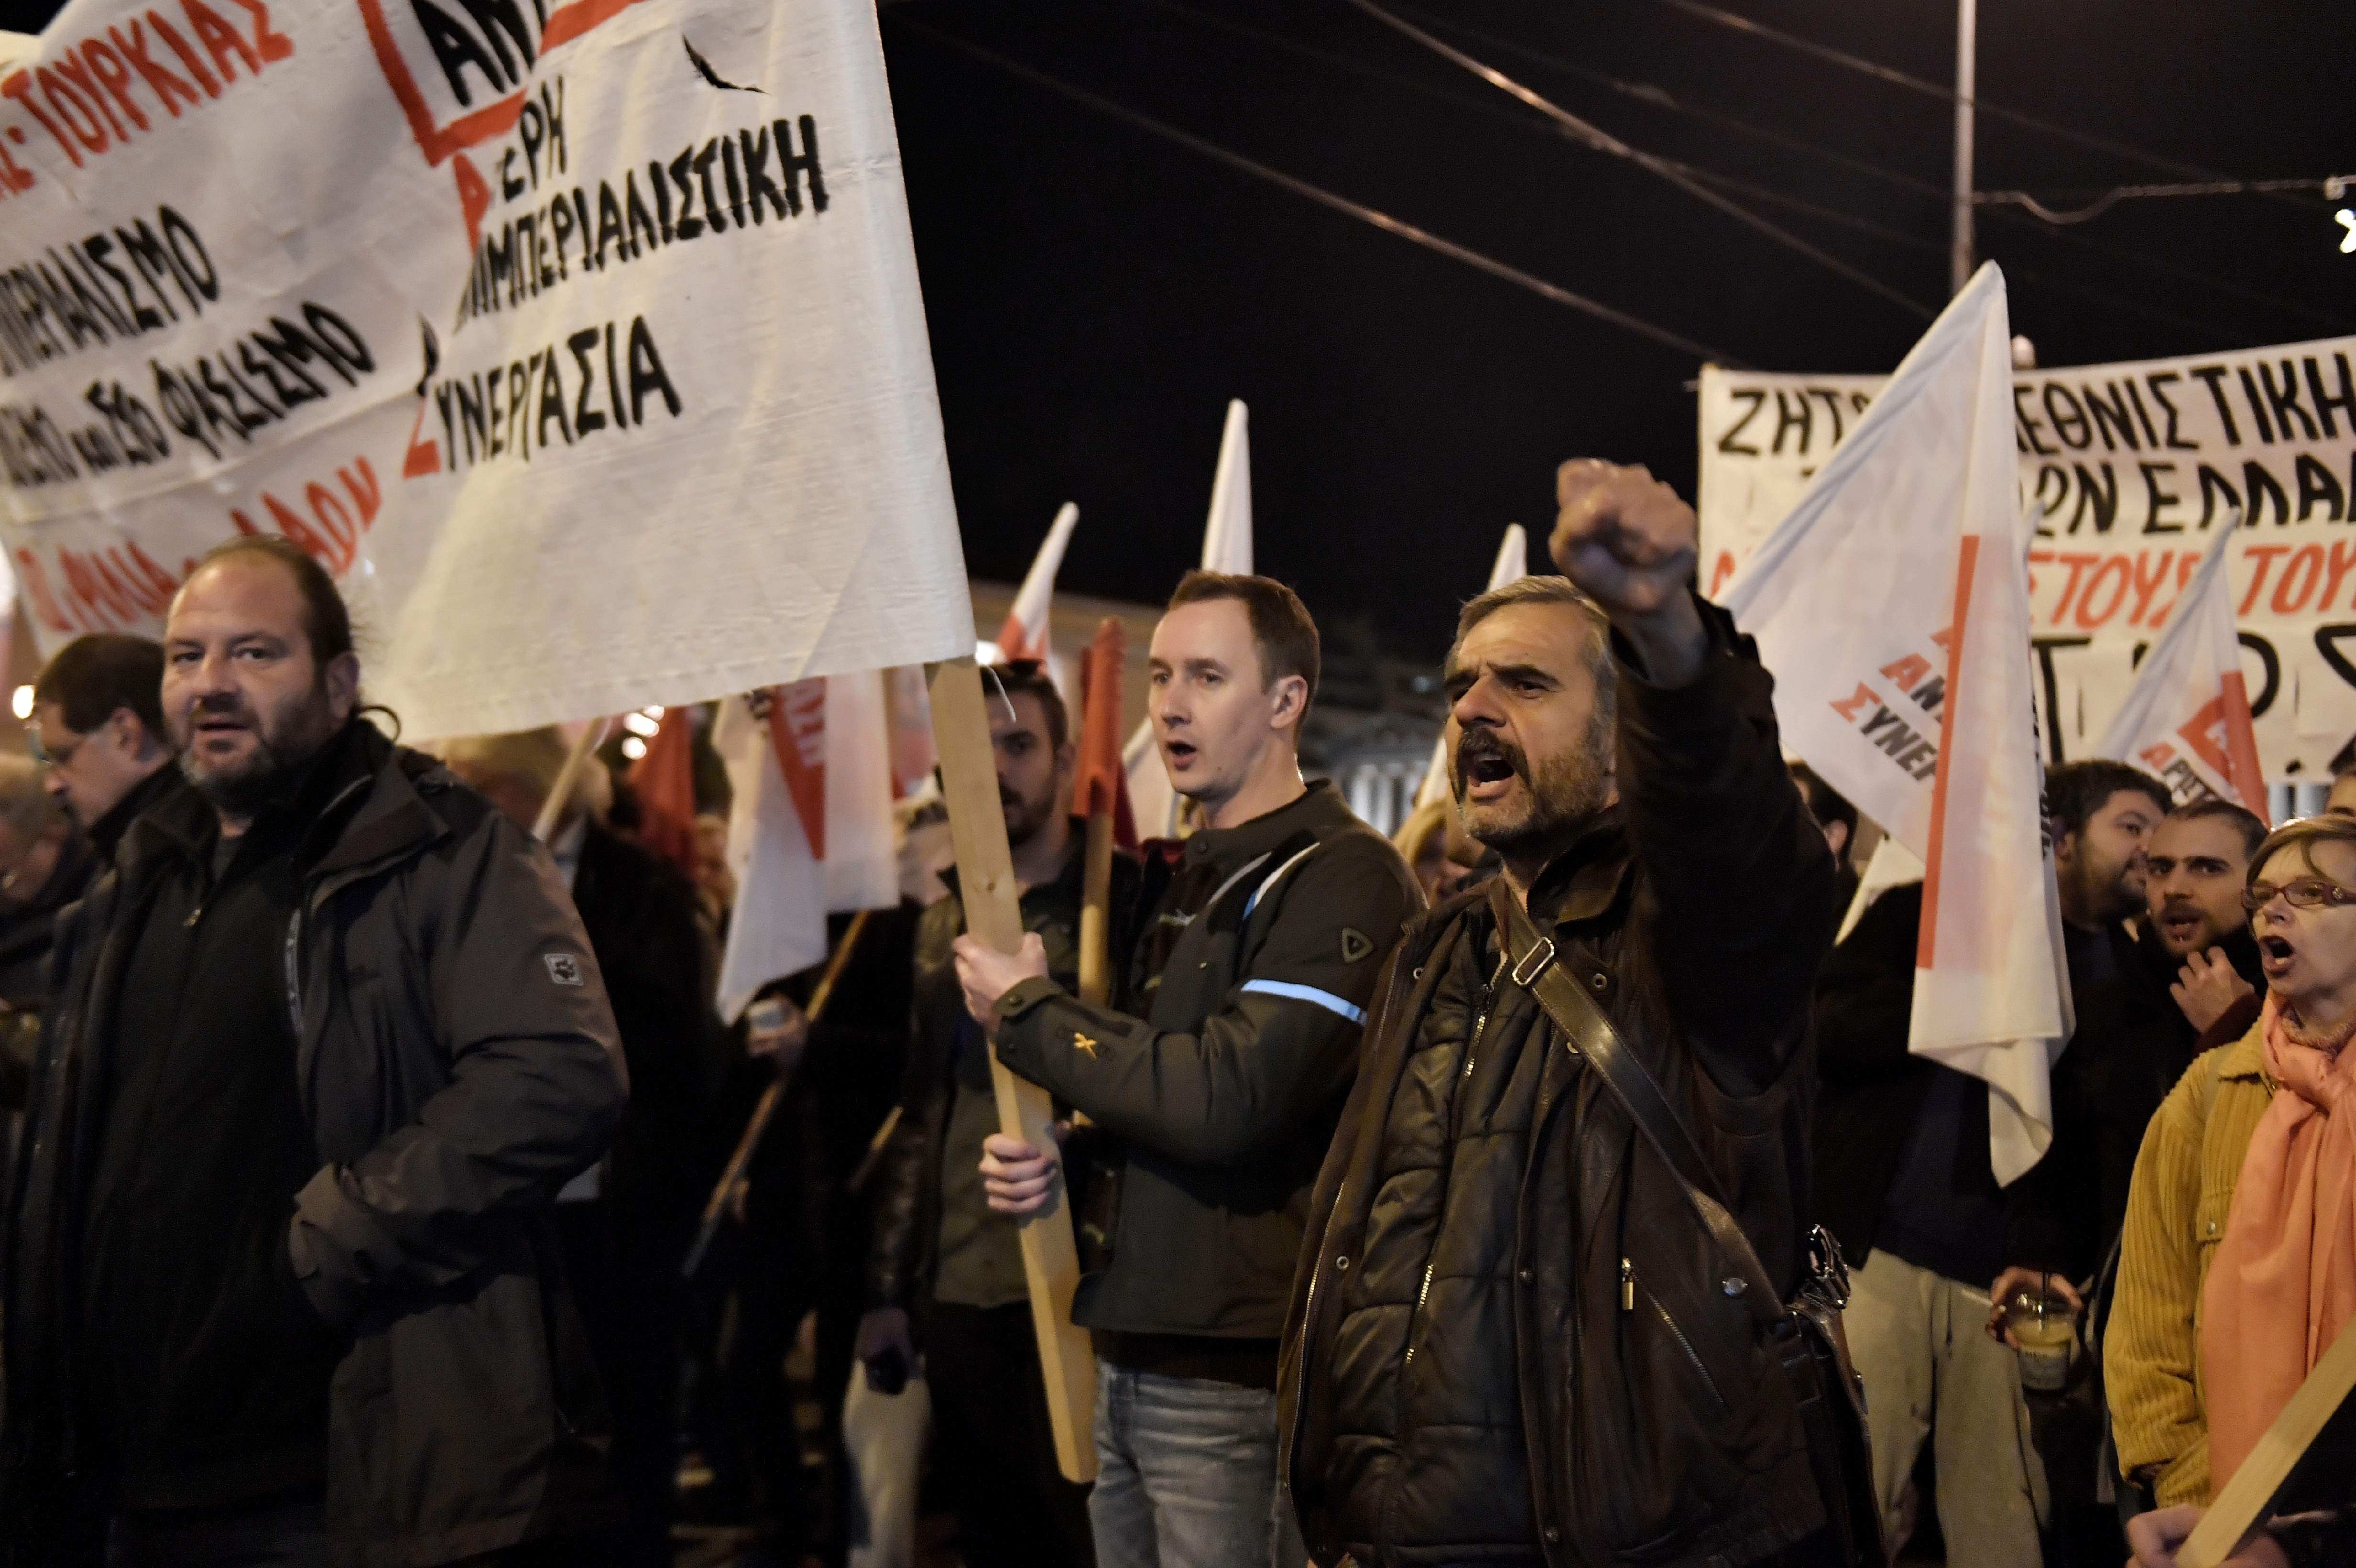 مظاهرات ضد زيارة أردوغان لليونان